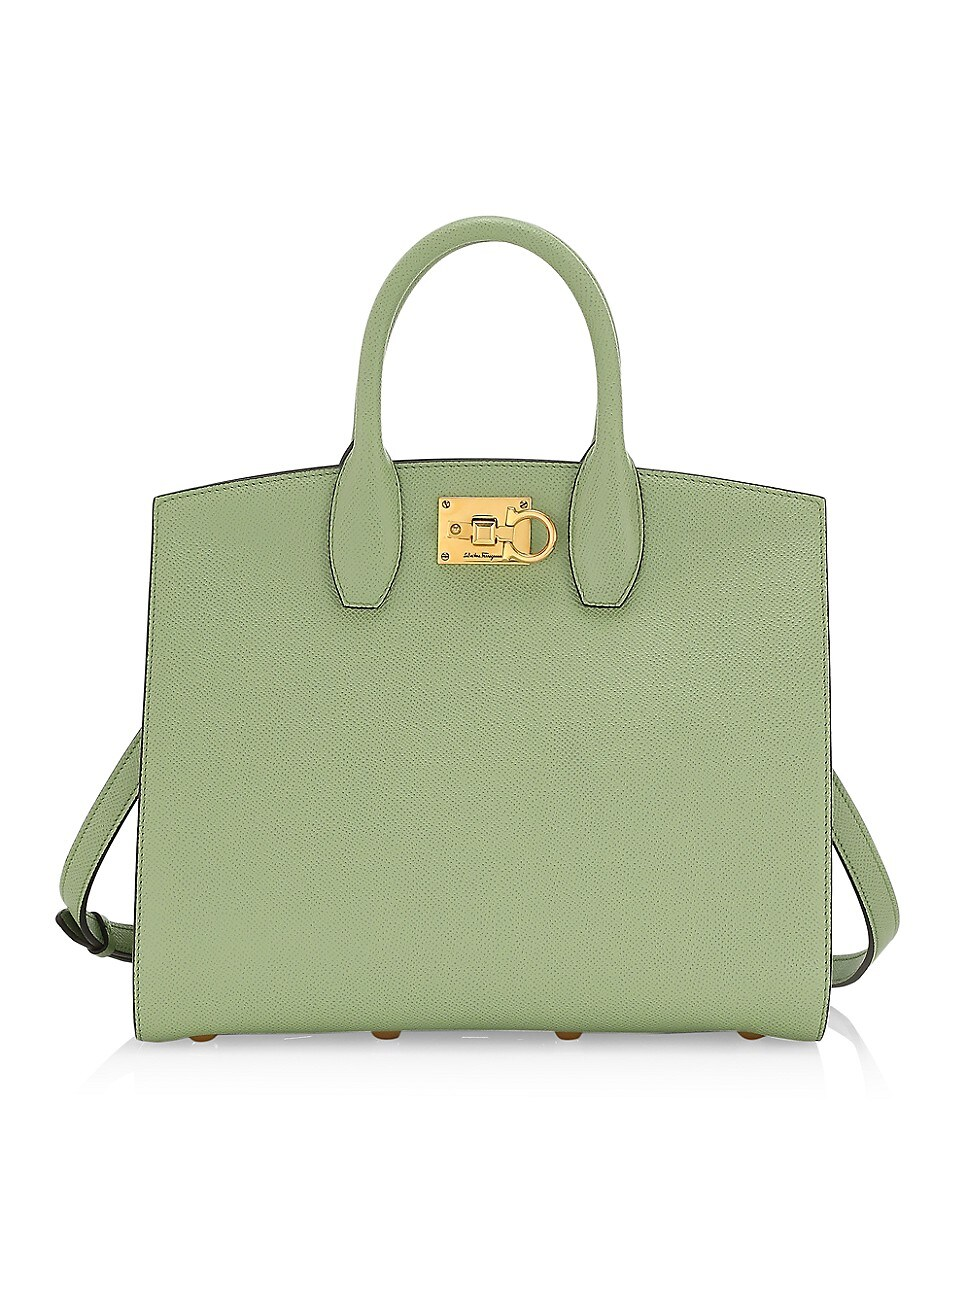 Salvatore Ferragamo Leathers WOMEN'S STUDIO LEATHER TOP HANDLE BAG